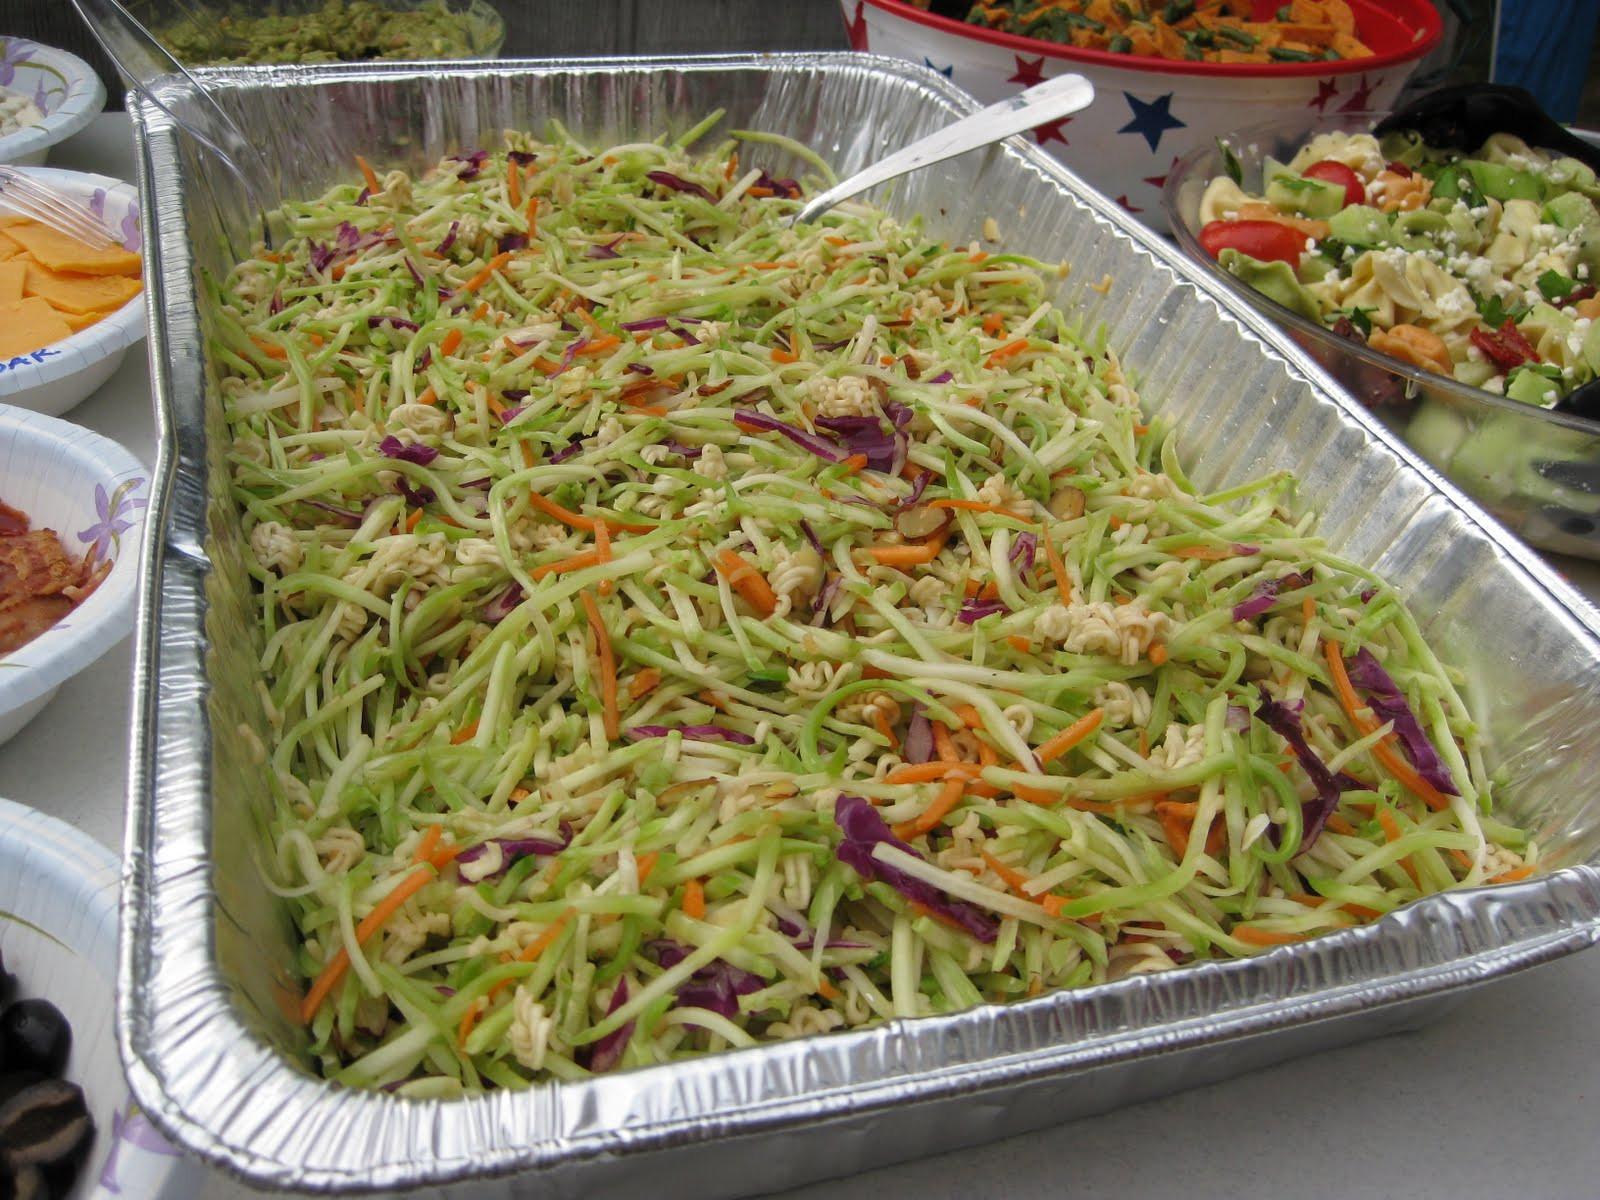 4Th Of July Side Dishes  4th of july side dishes